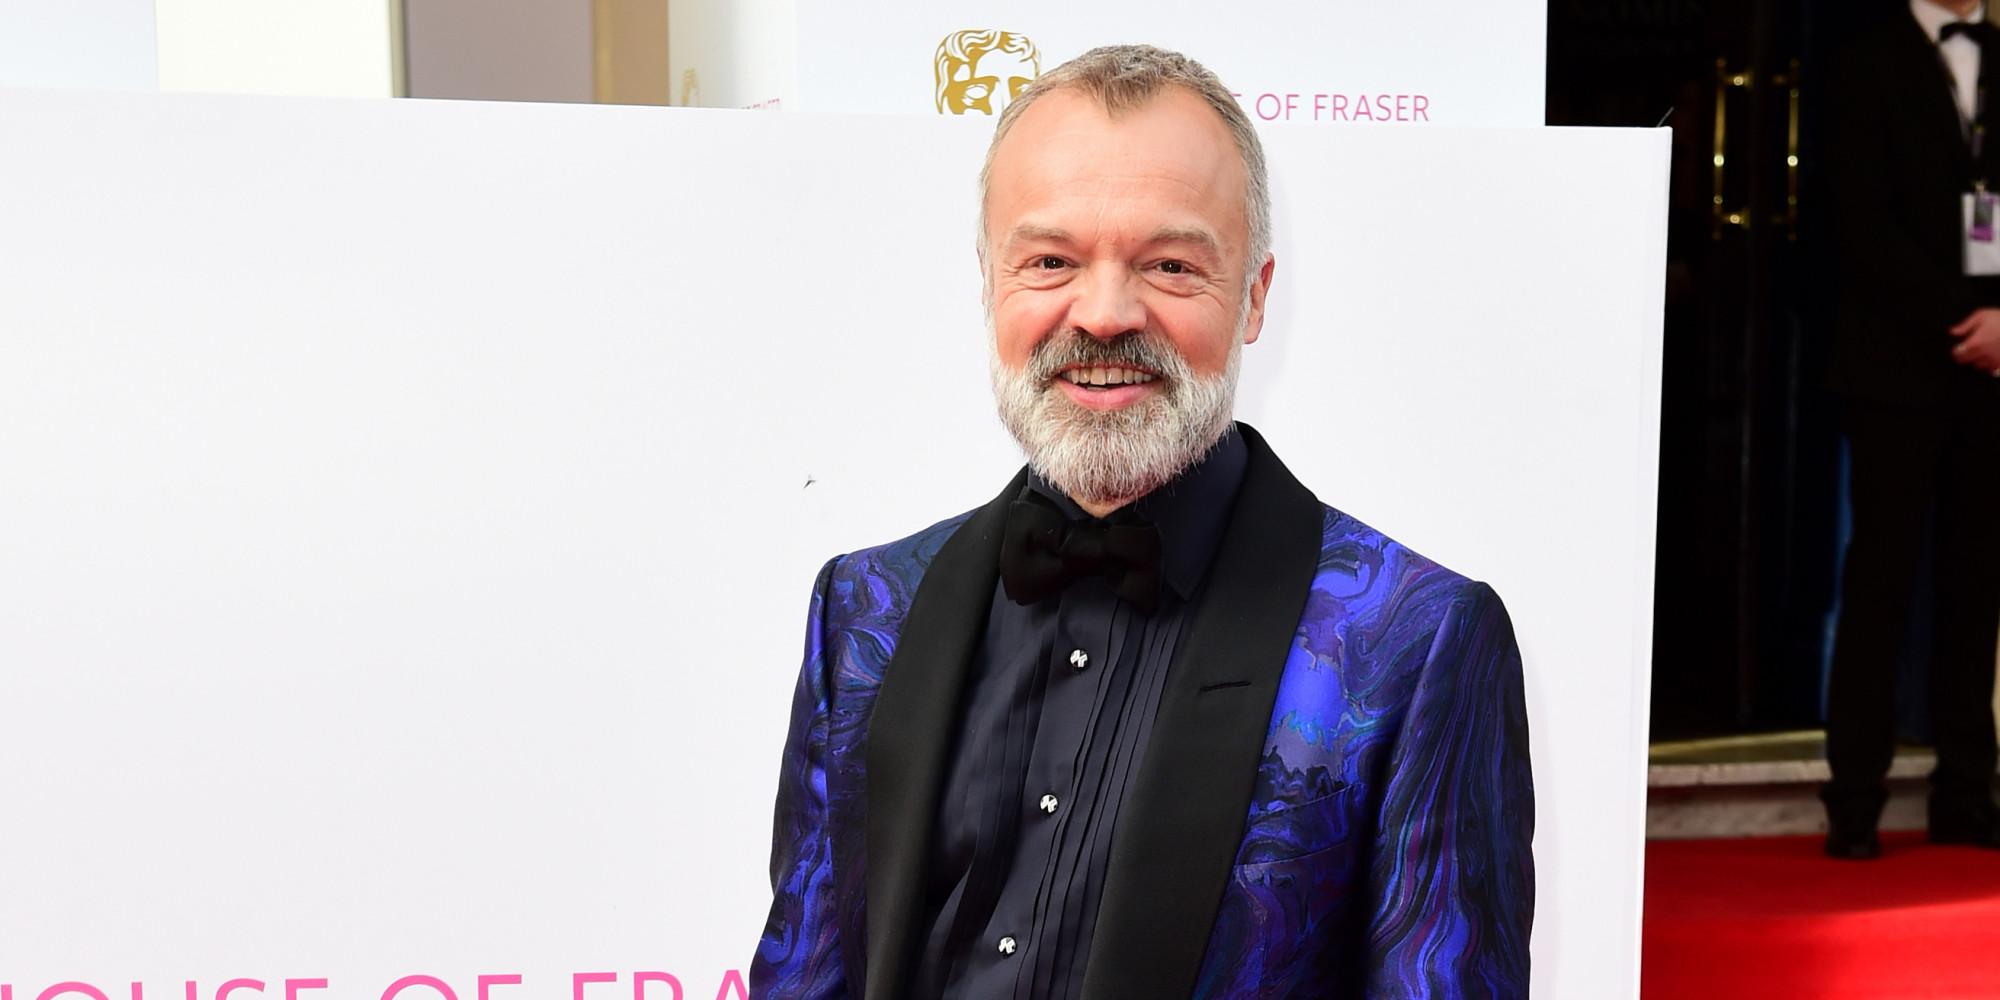 EUROVISION SONG CONTEST: BBC Host Graham Norton Complains ...